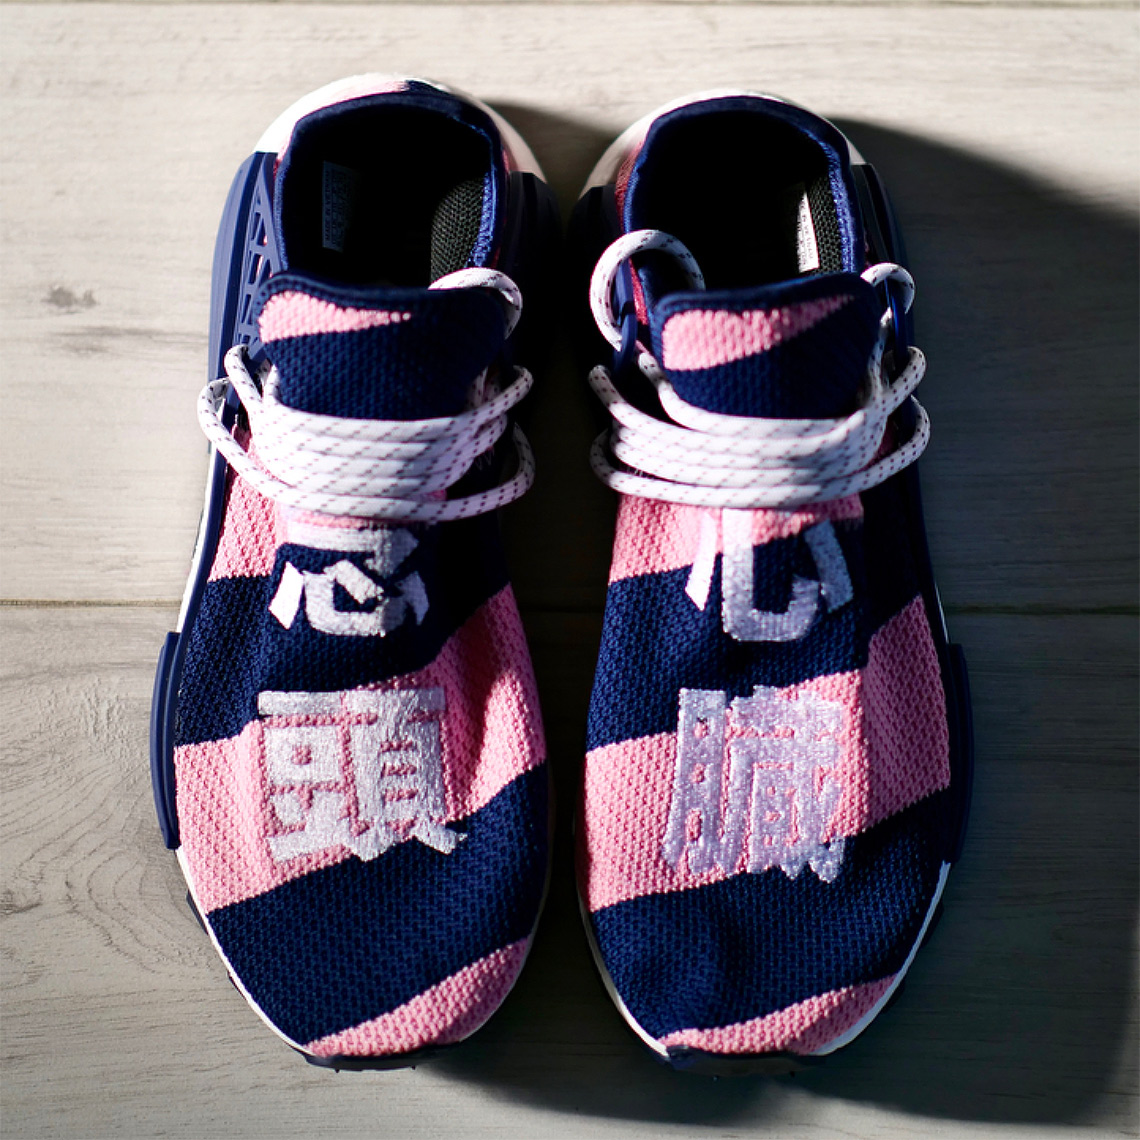 quality design d675c aad46 Pharrell BBC adidas NMD Hu G26277 Release Info   SneakerNews.com